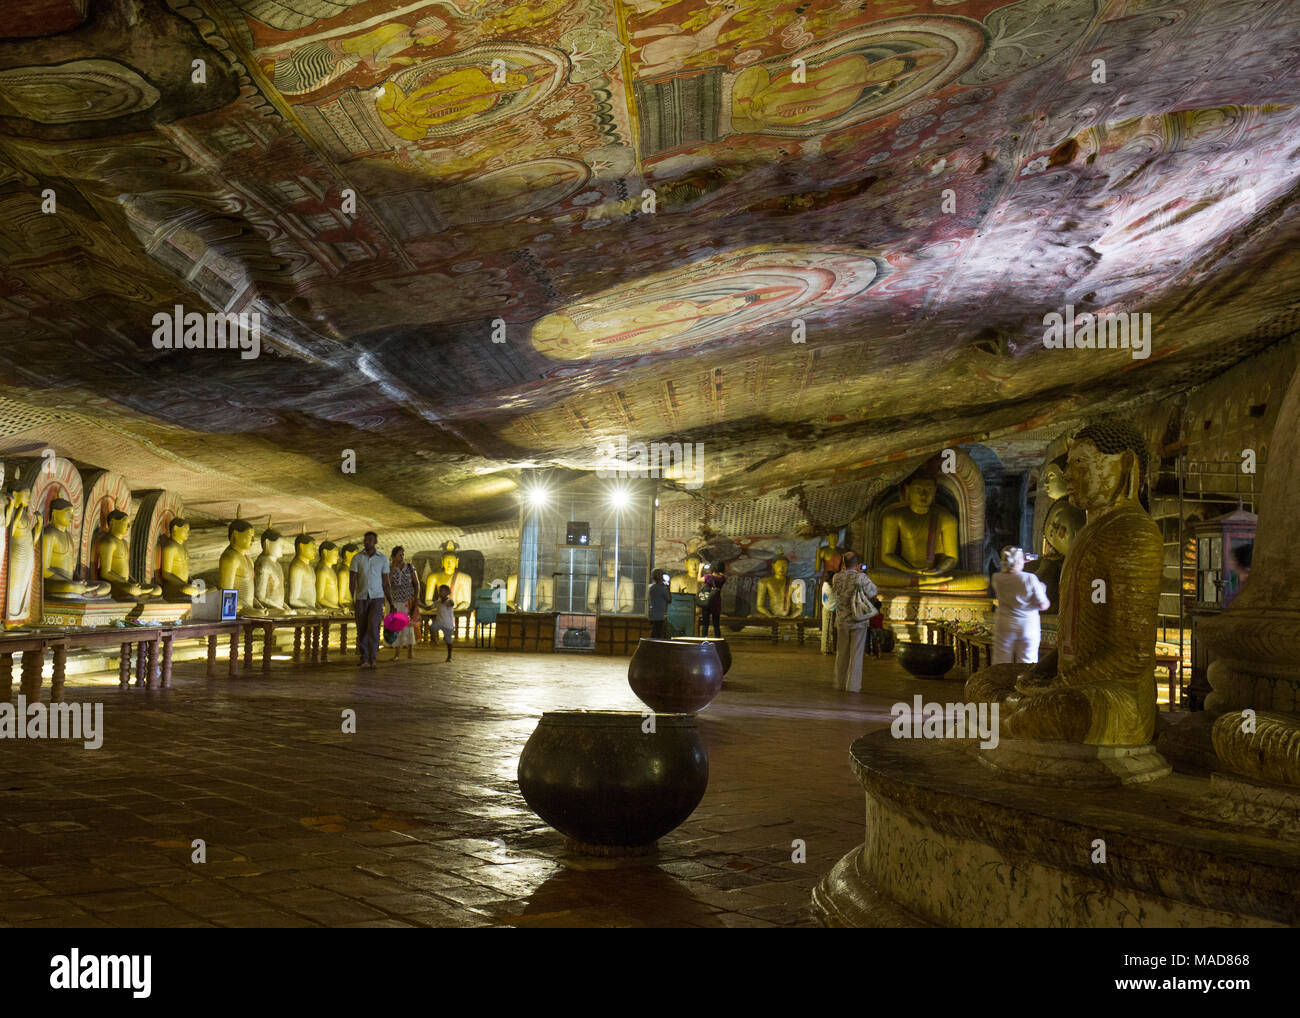 Tourists inside Dambulla Cave Temple, Dambulla, Sri Lanka, Asia. - Stock Image